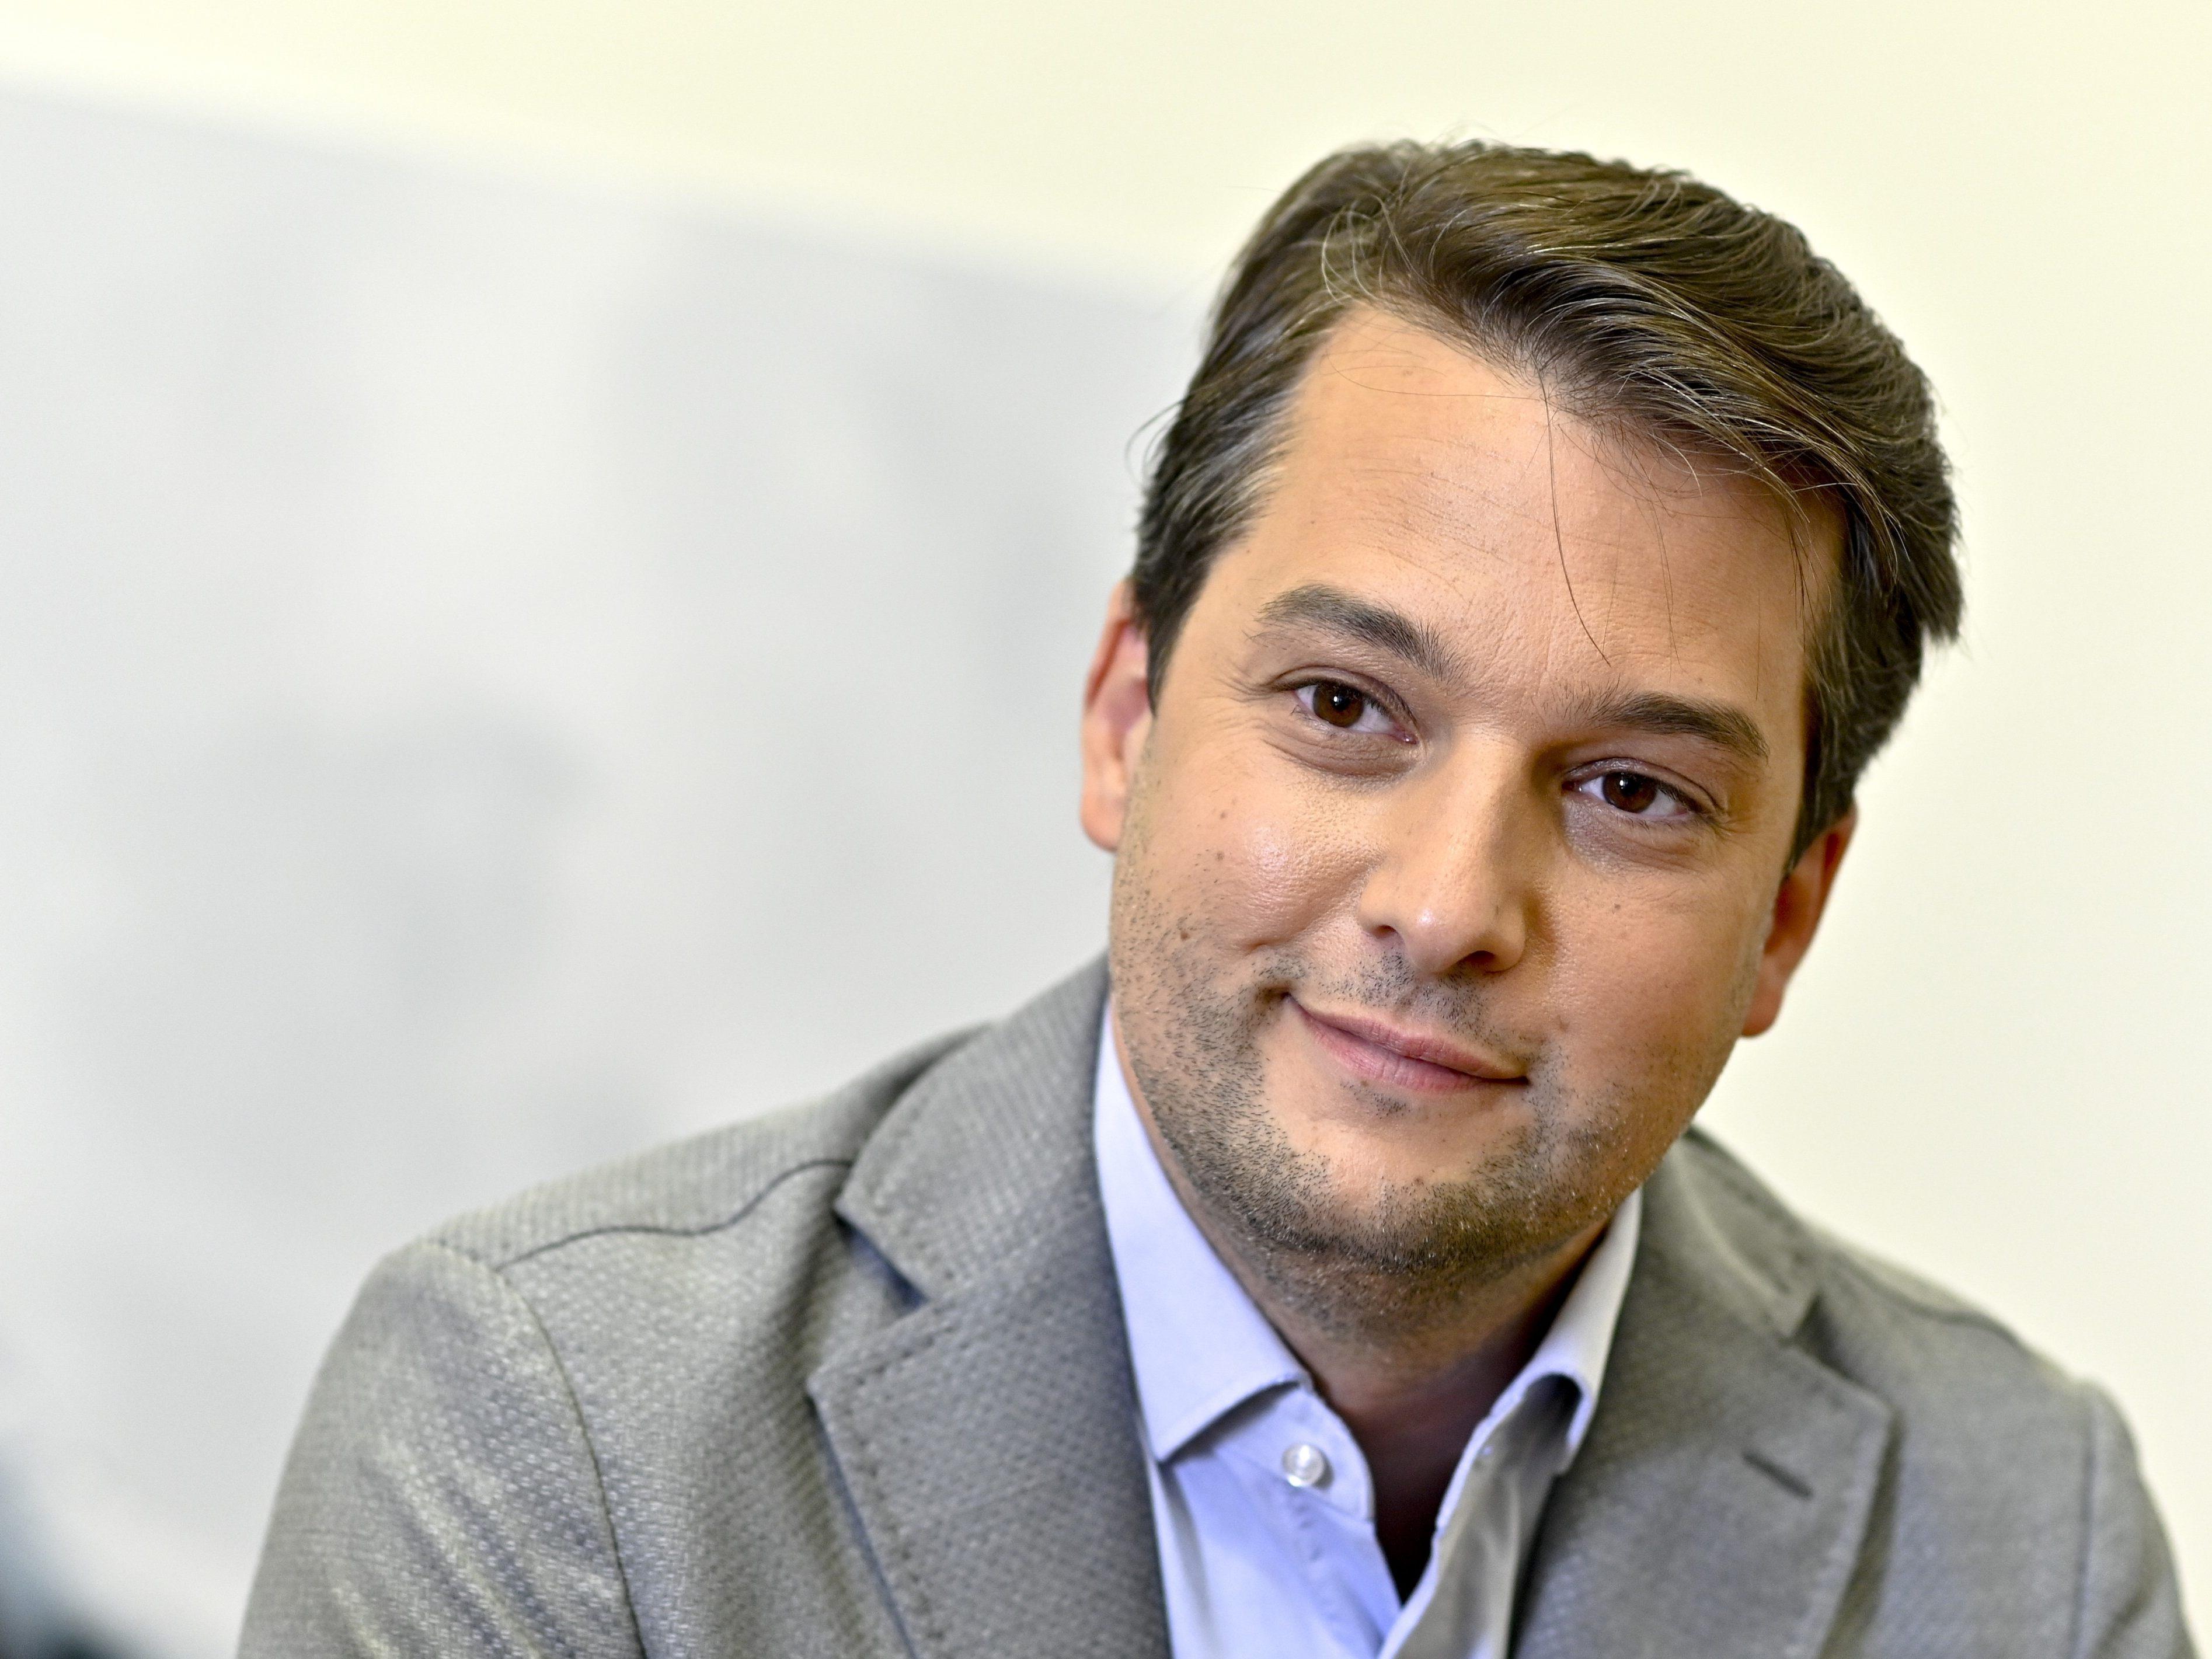 Dominik Nepp